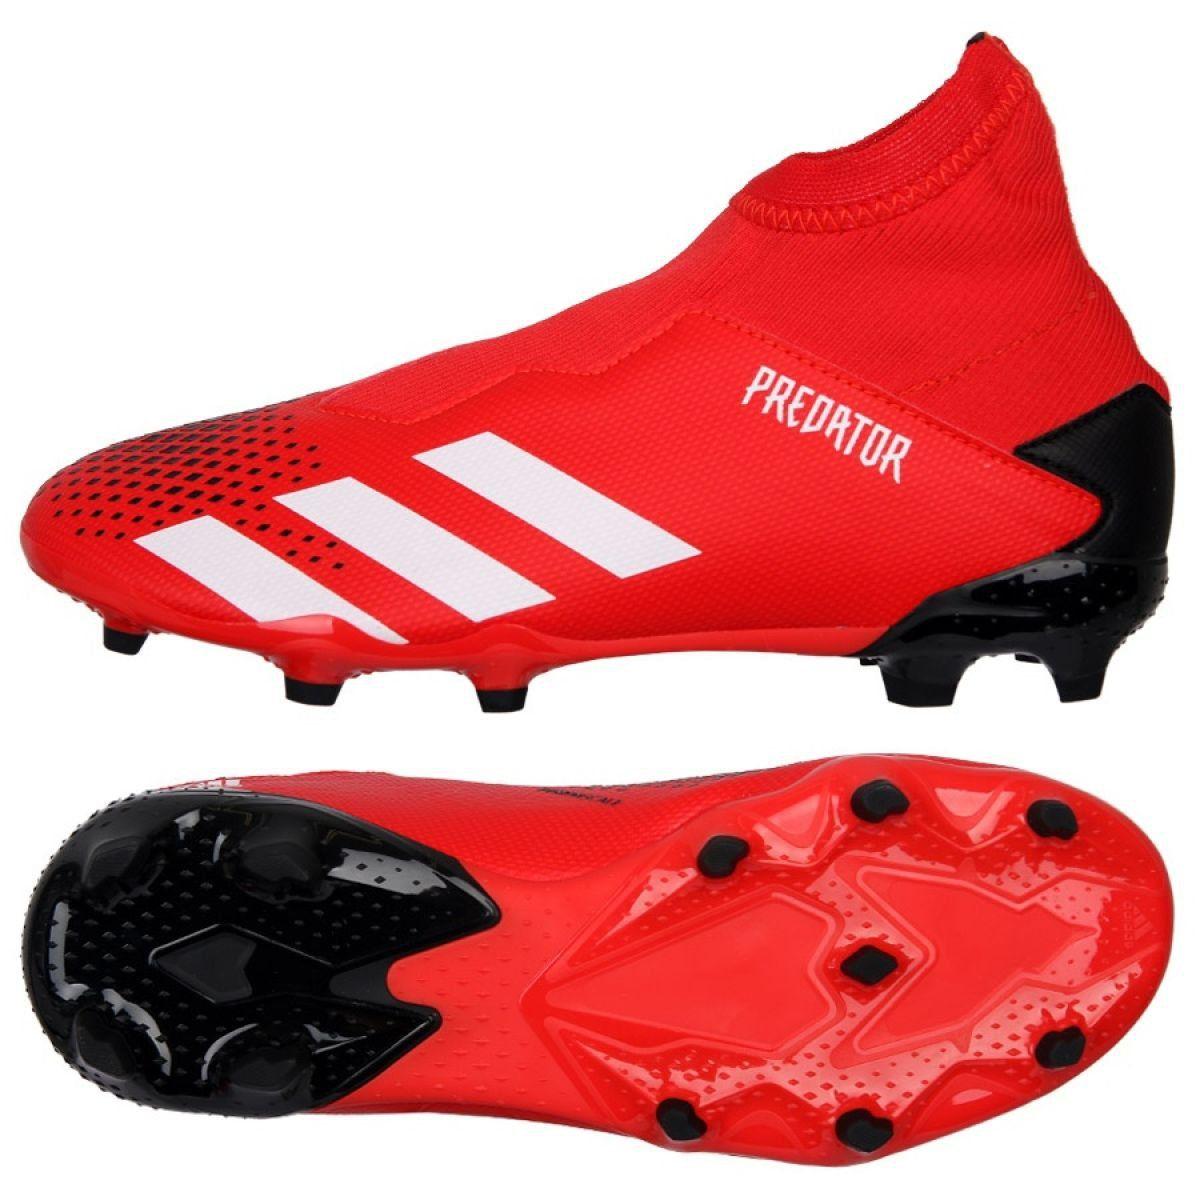 Buty Pilkarskie Adidas Predator 20 3 Ll Fg Jr Ef1907 Czerwone Czerwone Adidas Predator Adidas Sport Shoes